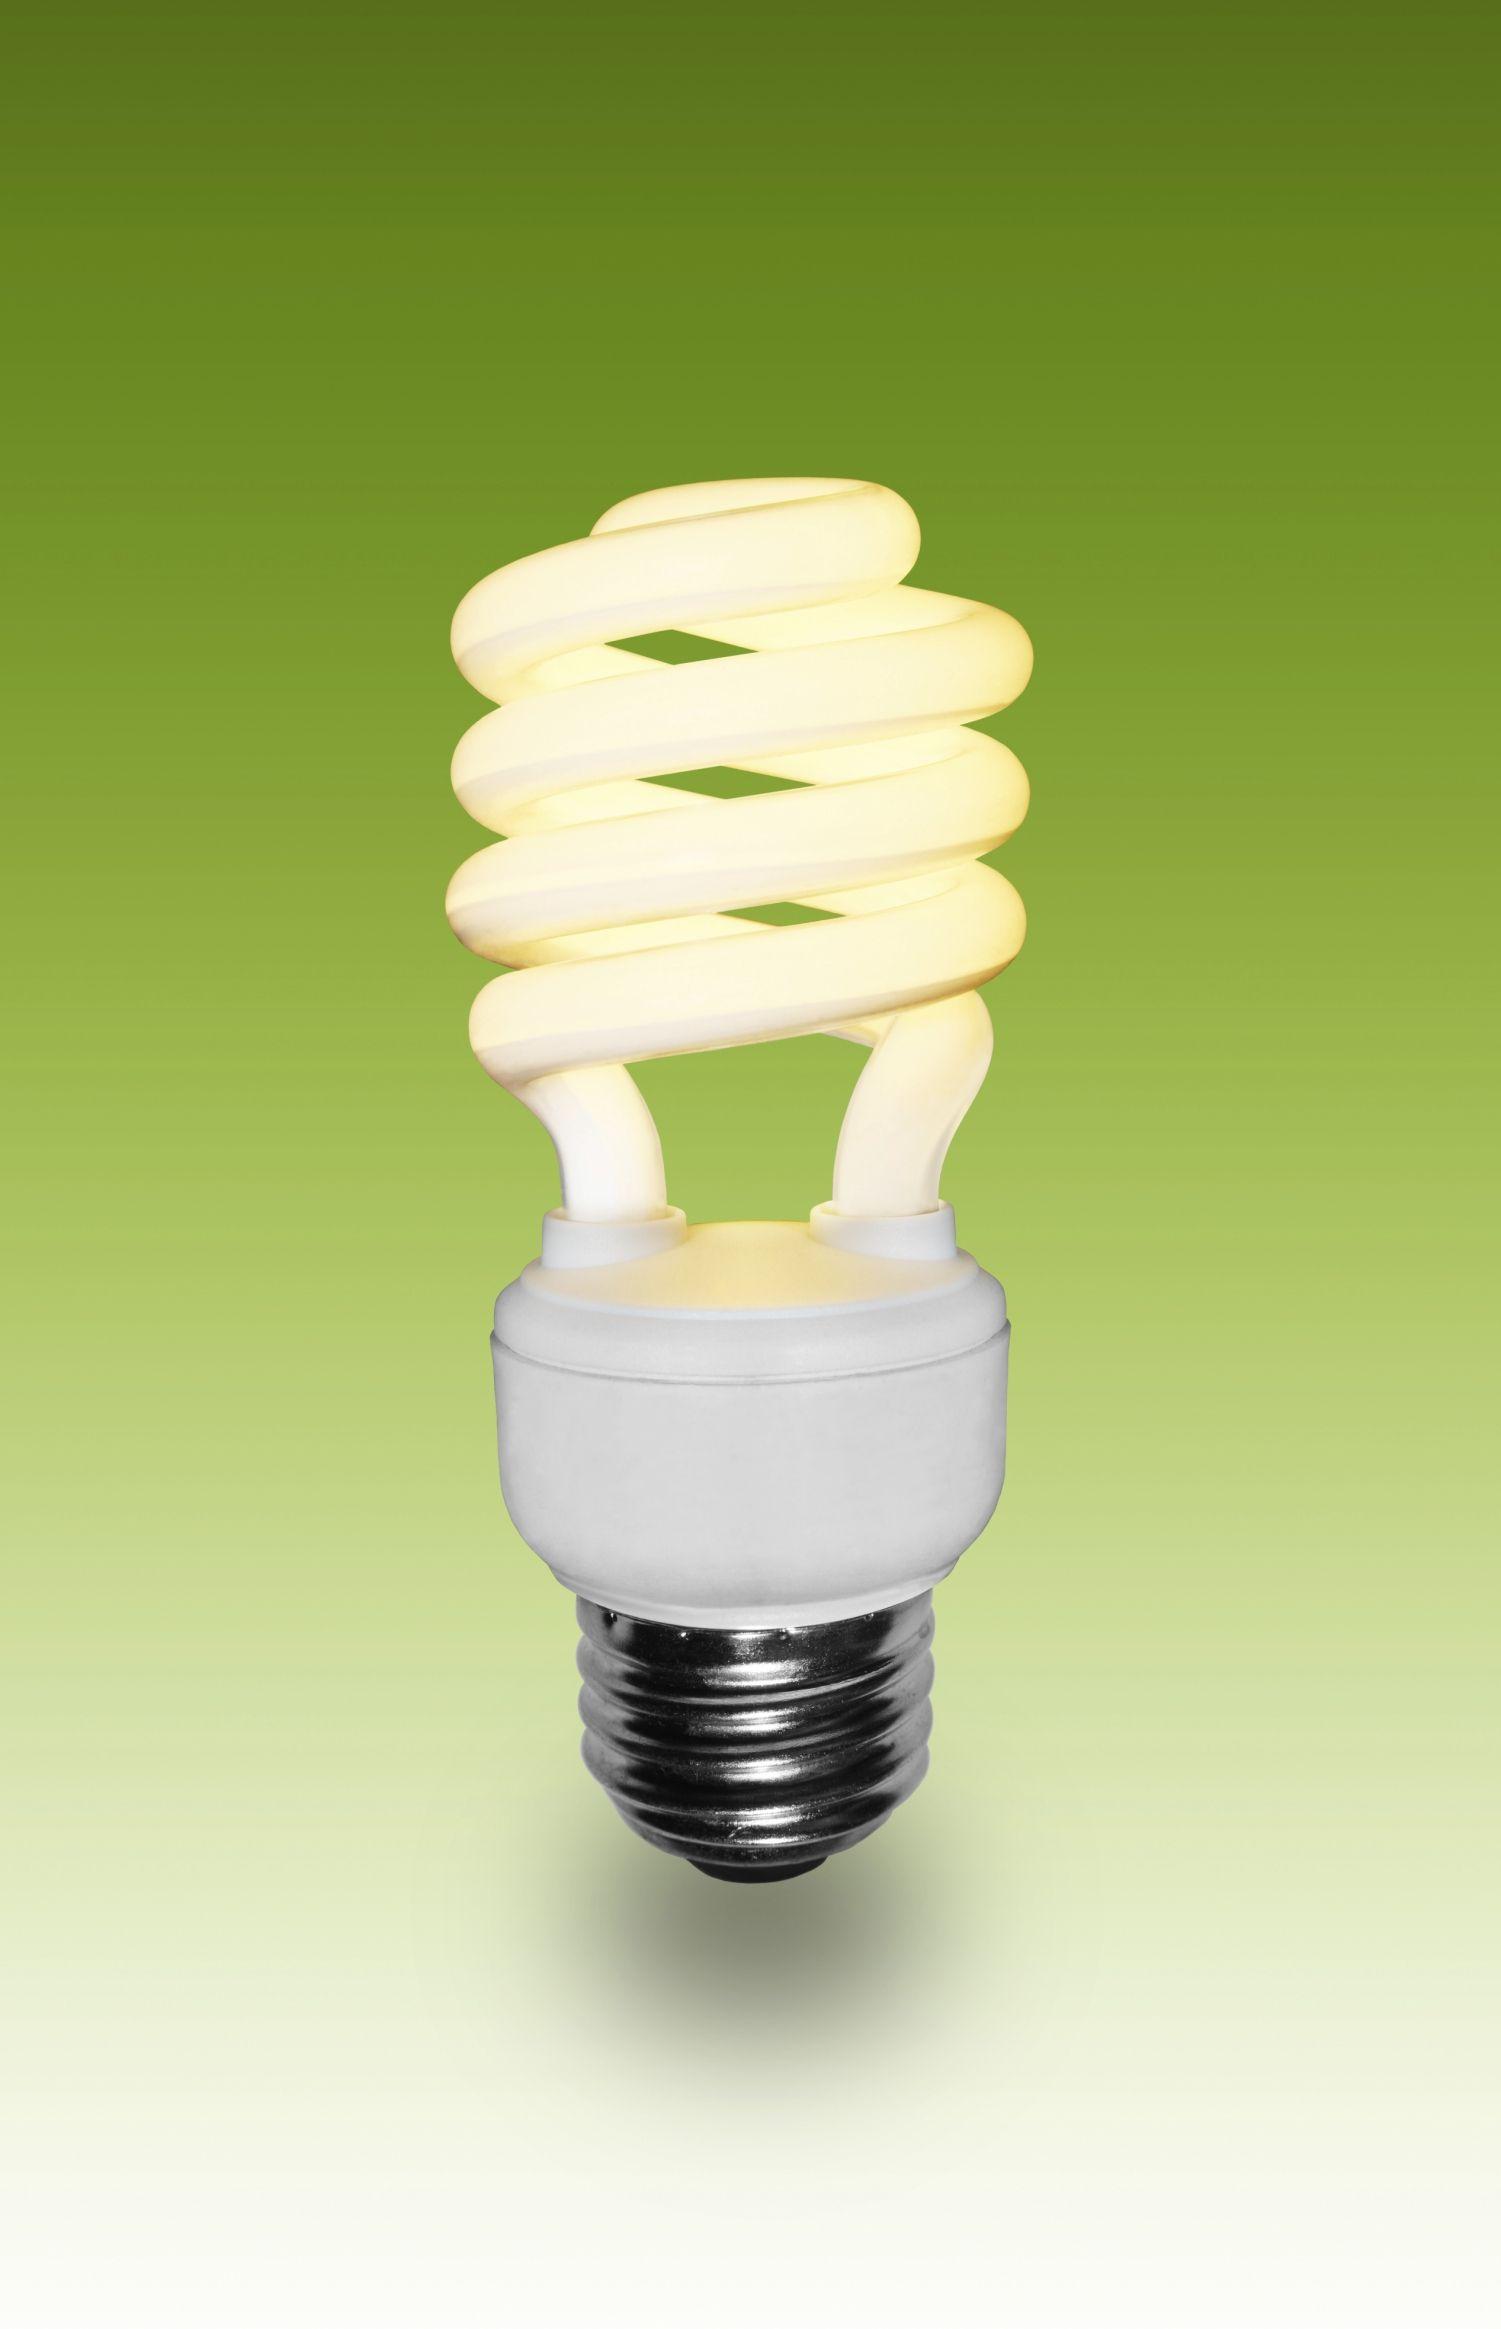 High Efficiency Light Bulbs Fire Hazard Http Johncow Us